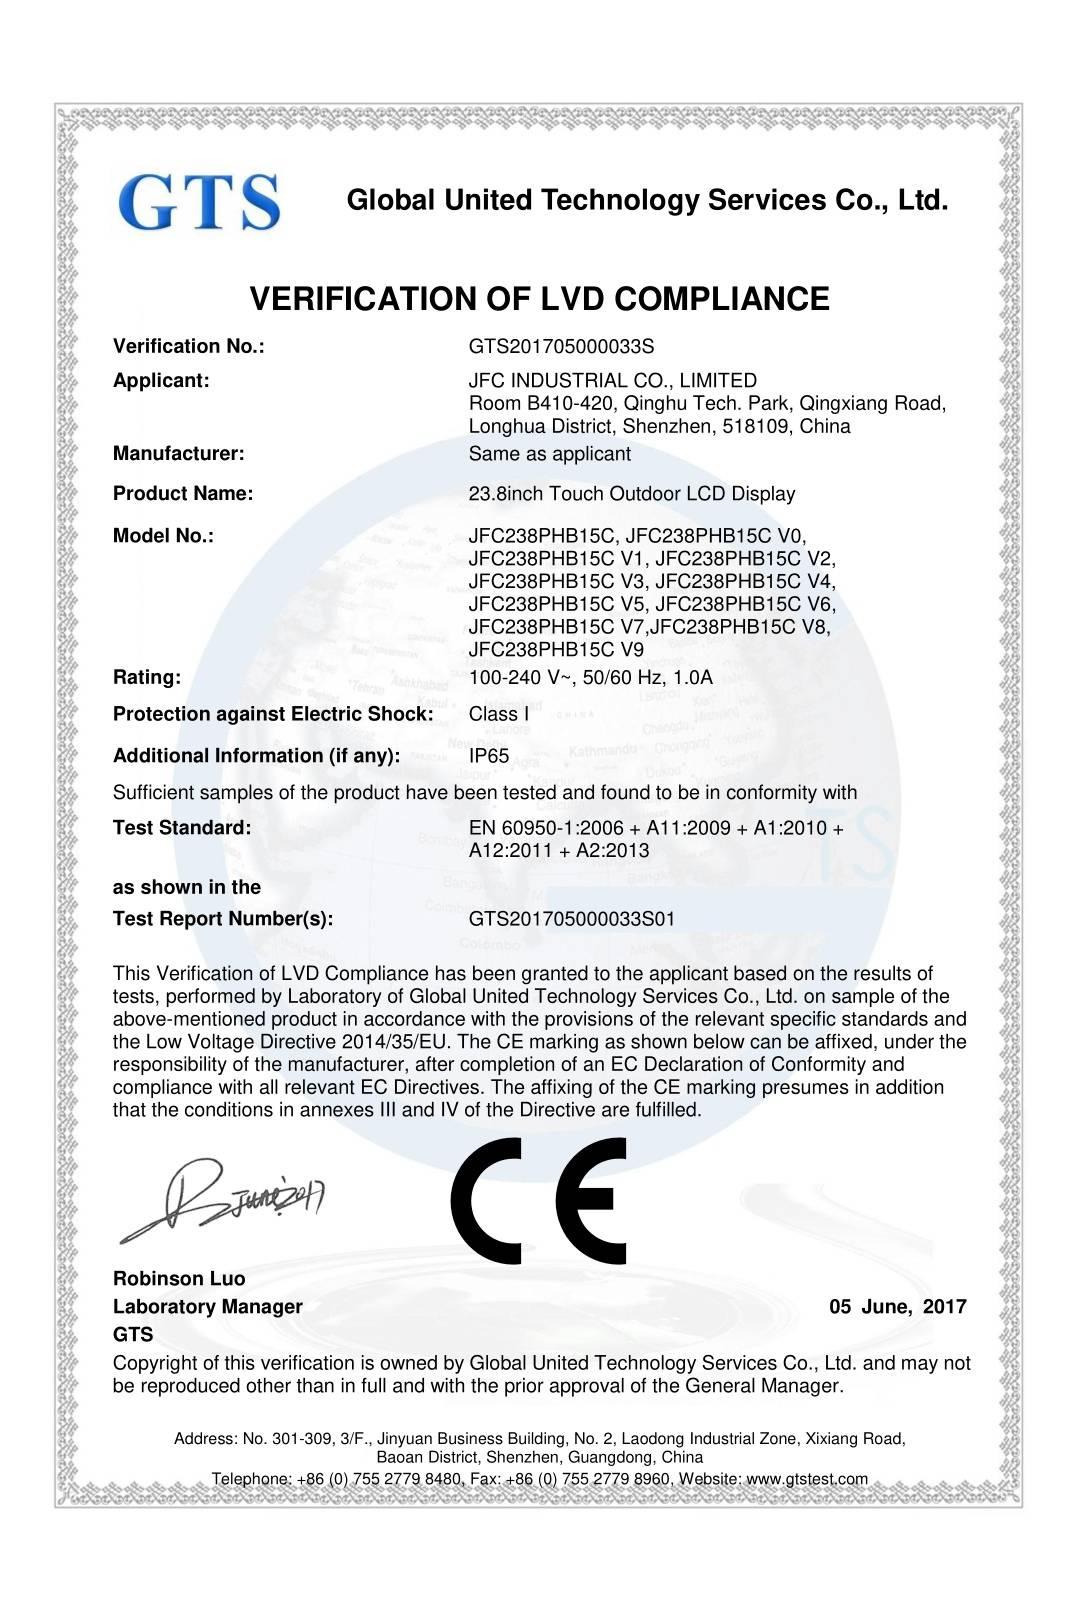 Verification of LVD Compliance